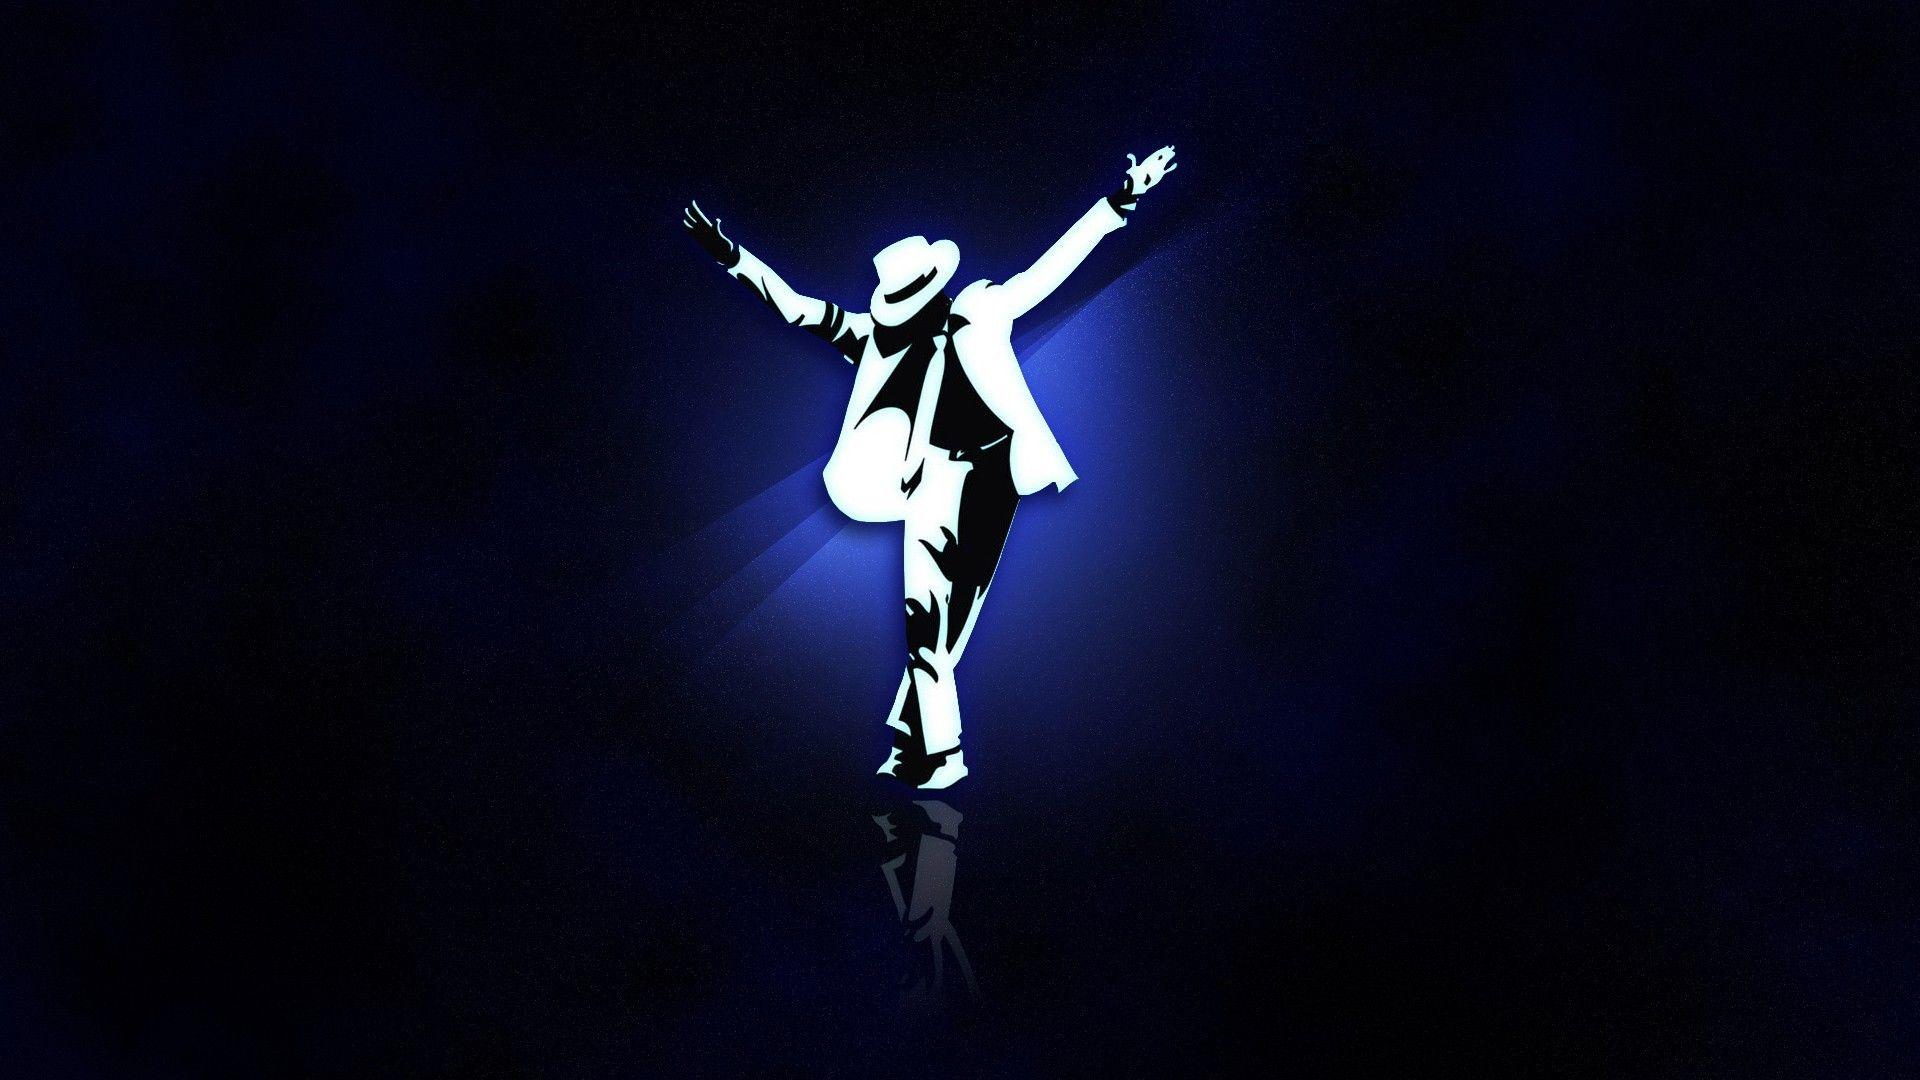 Images Michael Jackson Wallpaper HD. Jackson, Ische, 20er